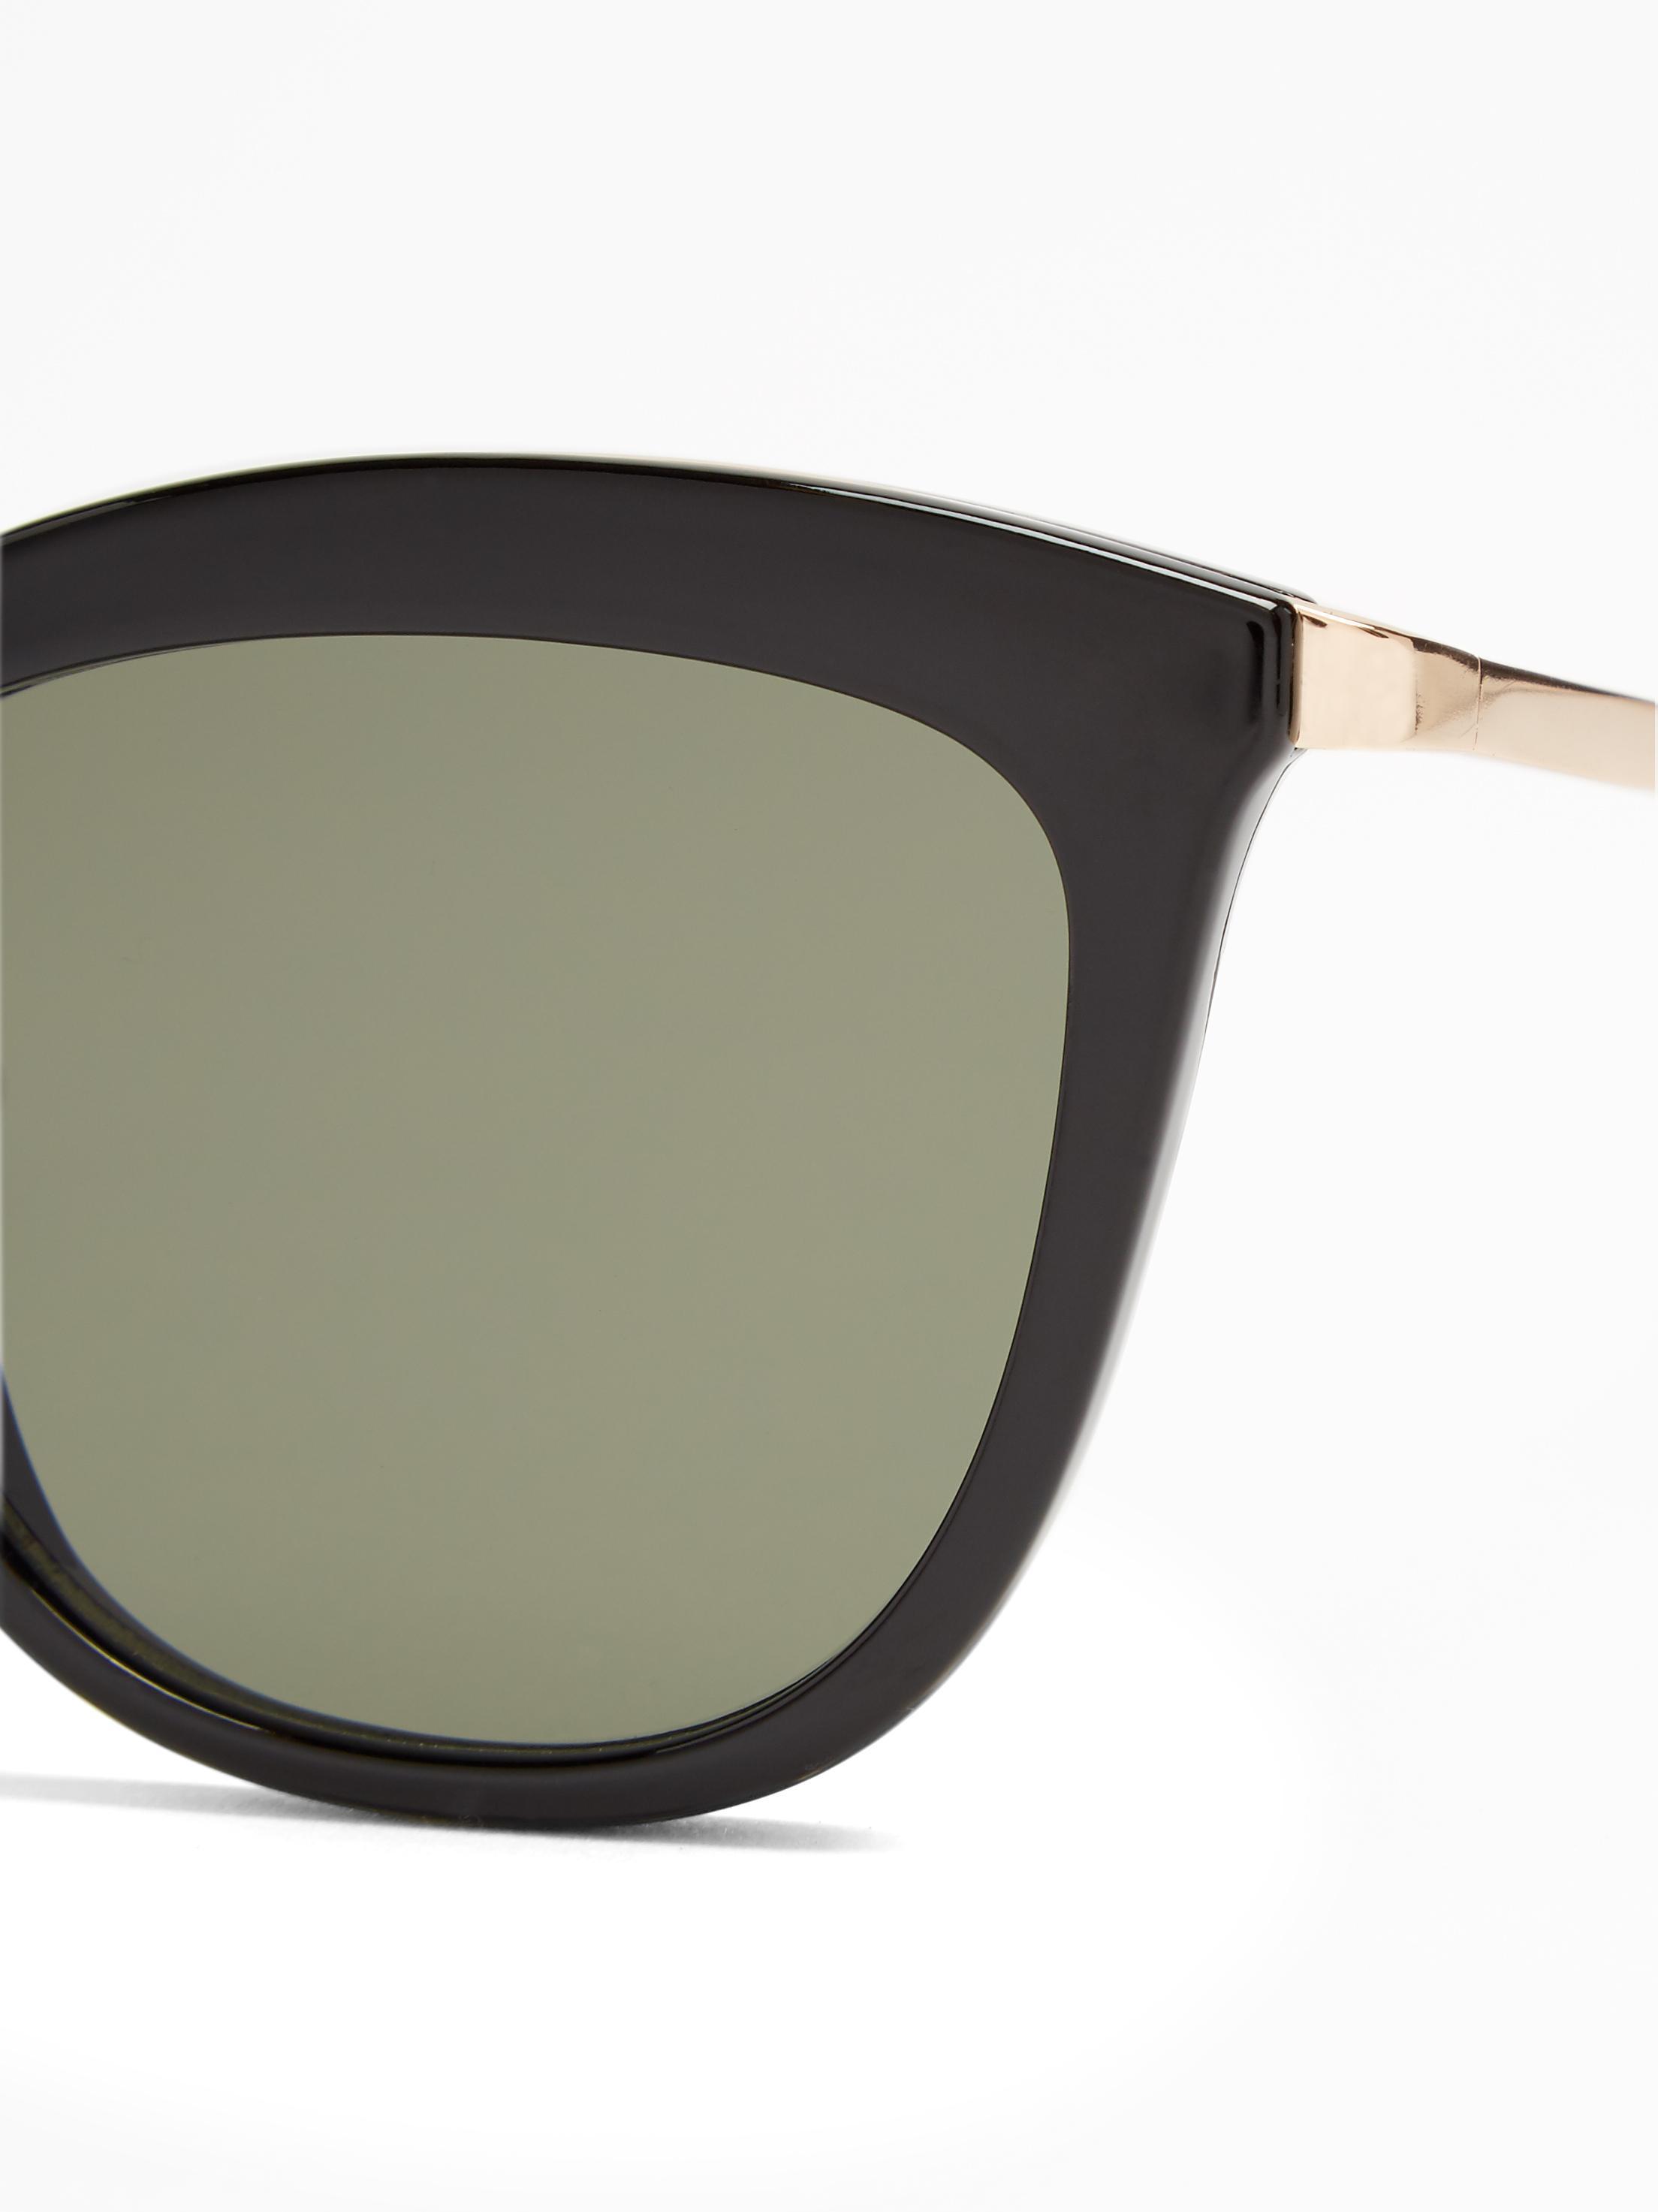 df94ac8003f Lyst - Le Specs Caliente Cat-eye Sunglasses in Black